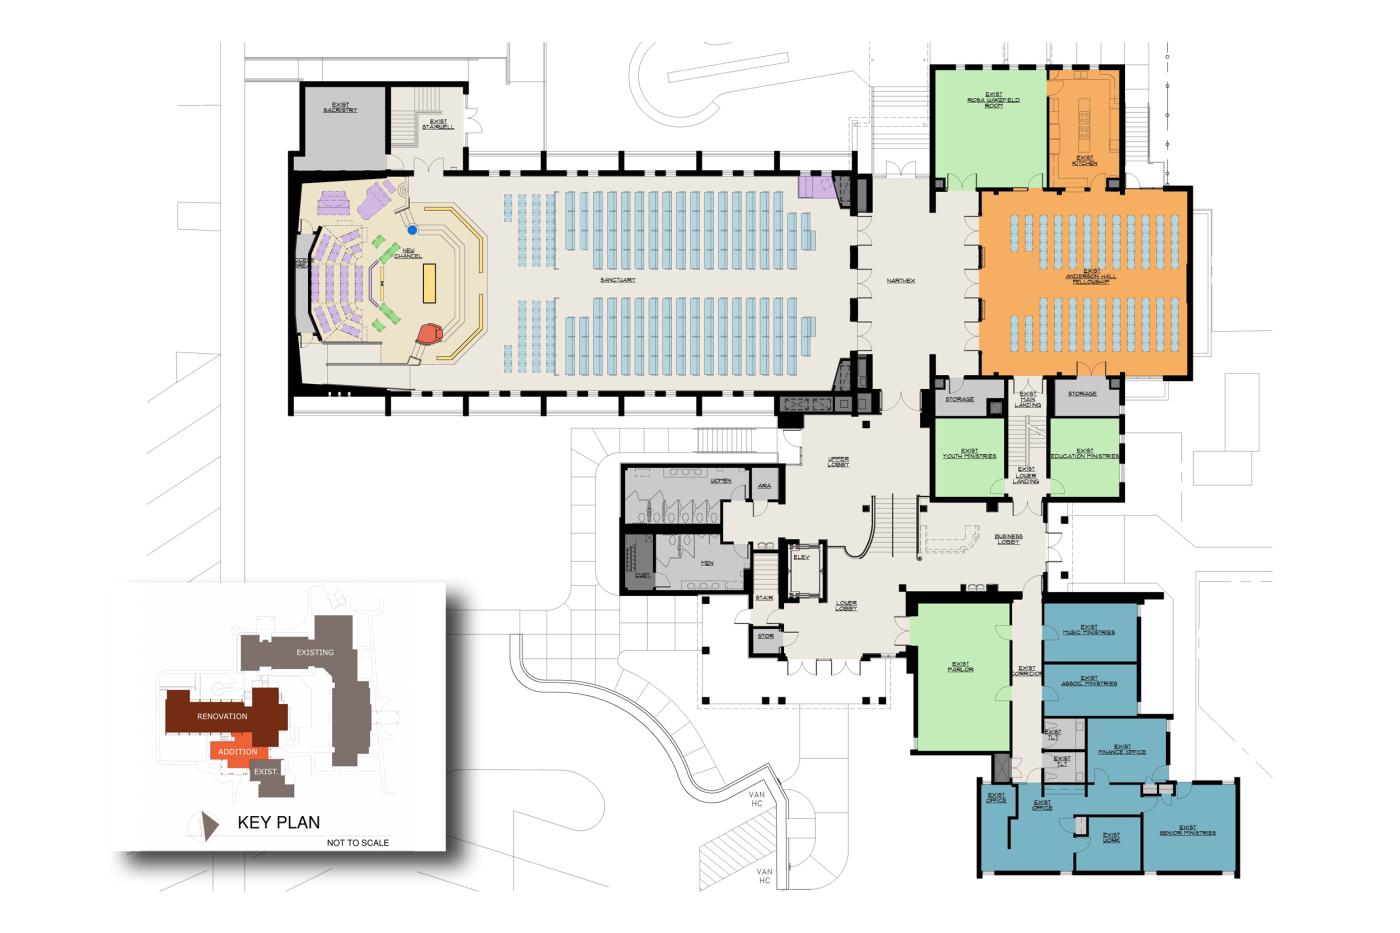 02-main-floor-plan.jpg